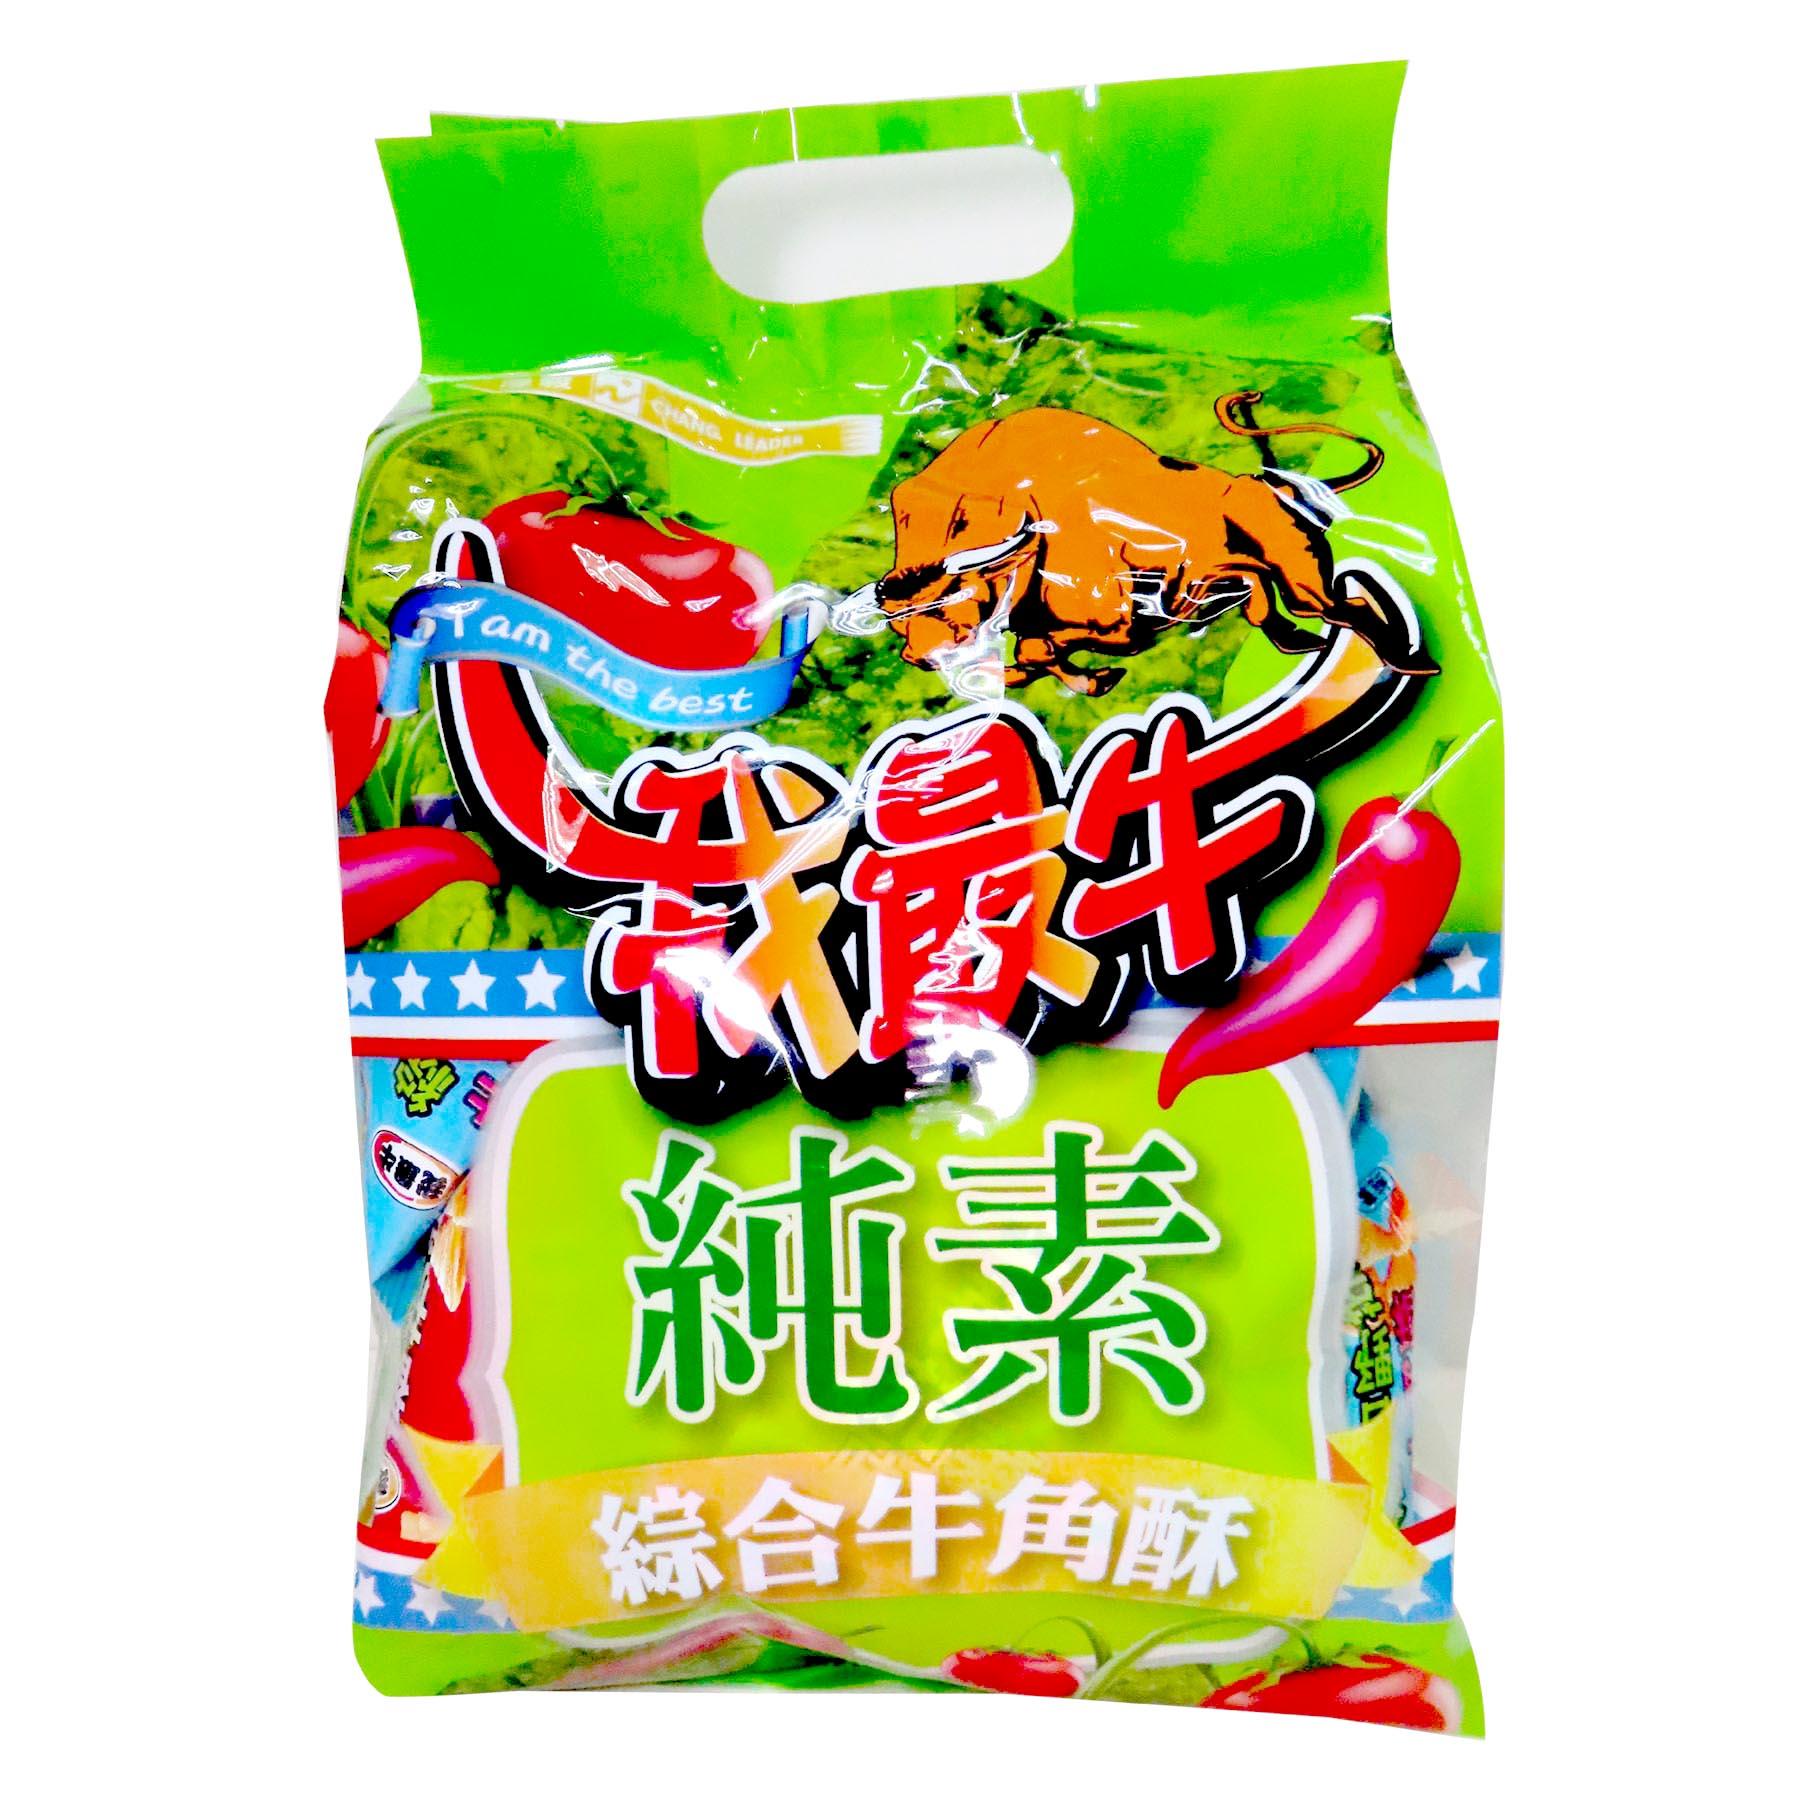 Image Assorted Cornsnack 我最牛 - 综合牛角酥 500grams